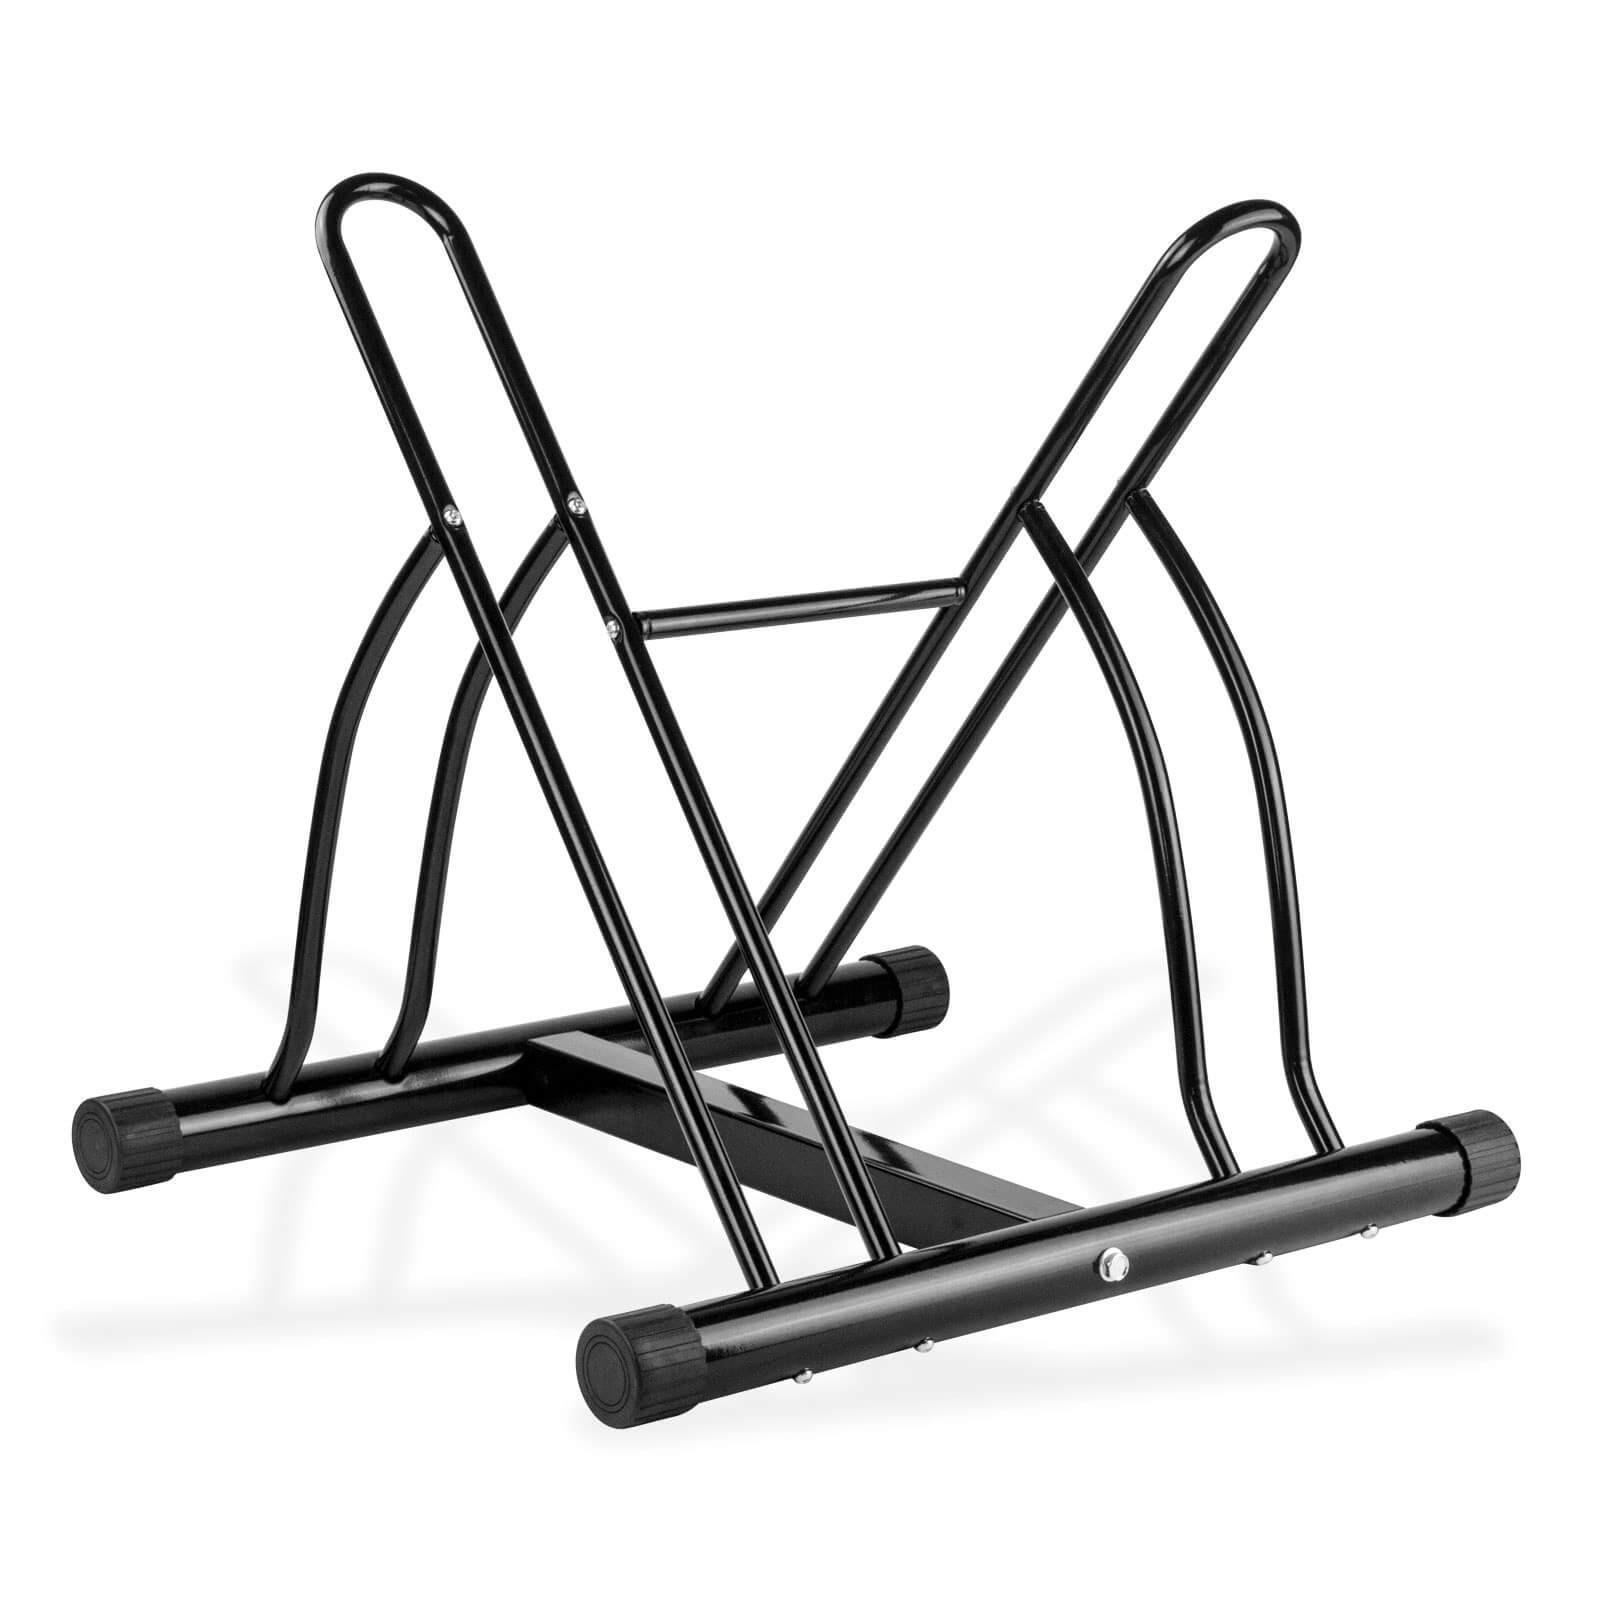 Fahrradständer / Fahrradhalter für 2 Fahrräder